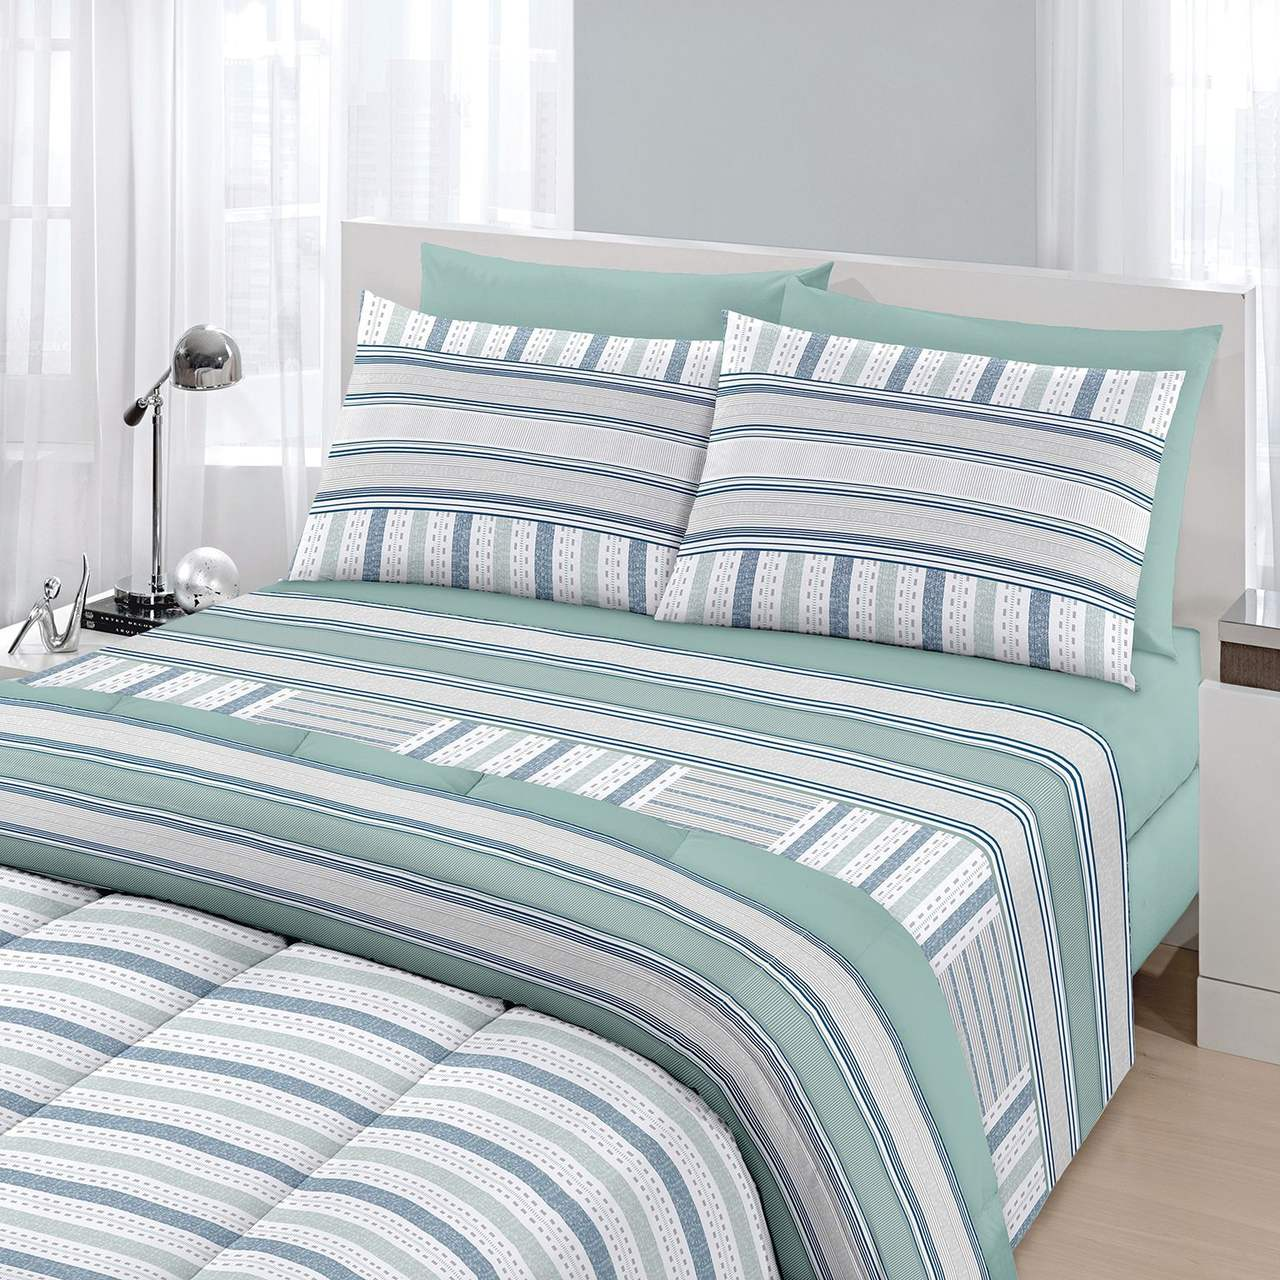 jogo de cama king Royal Boston 1 100% algodão estampado verde - Santista